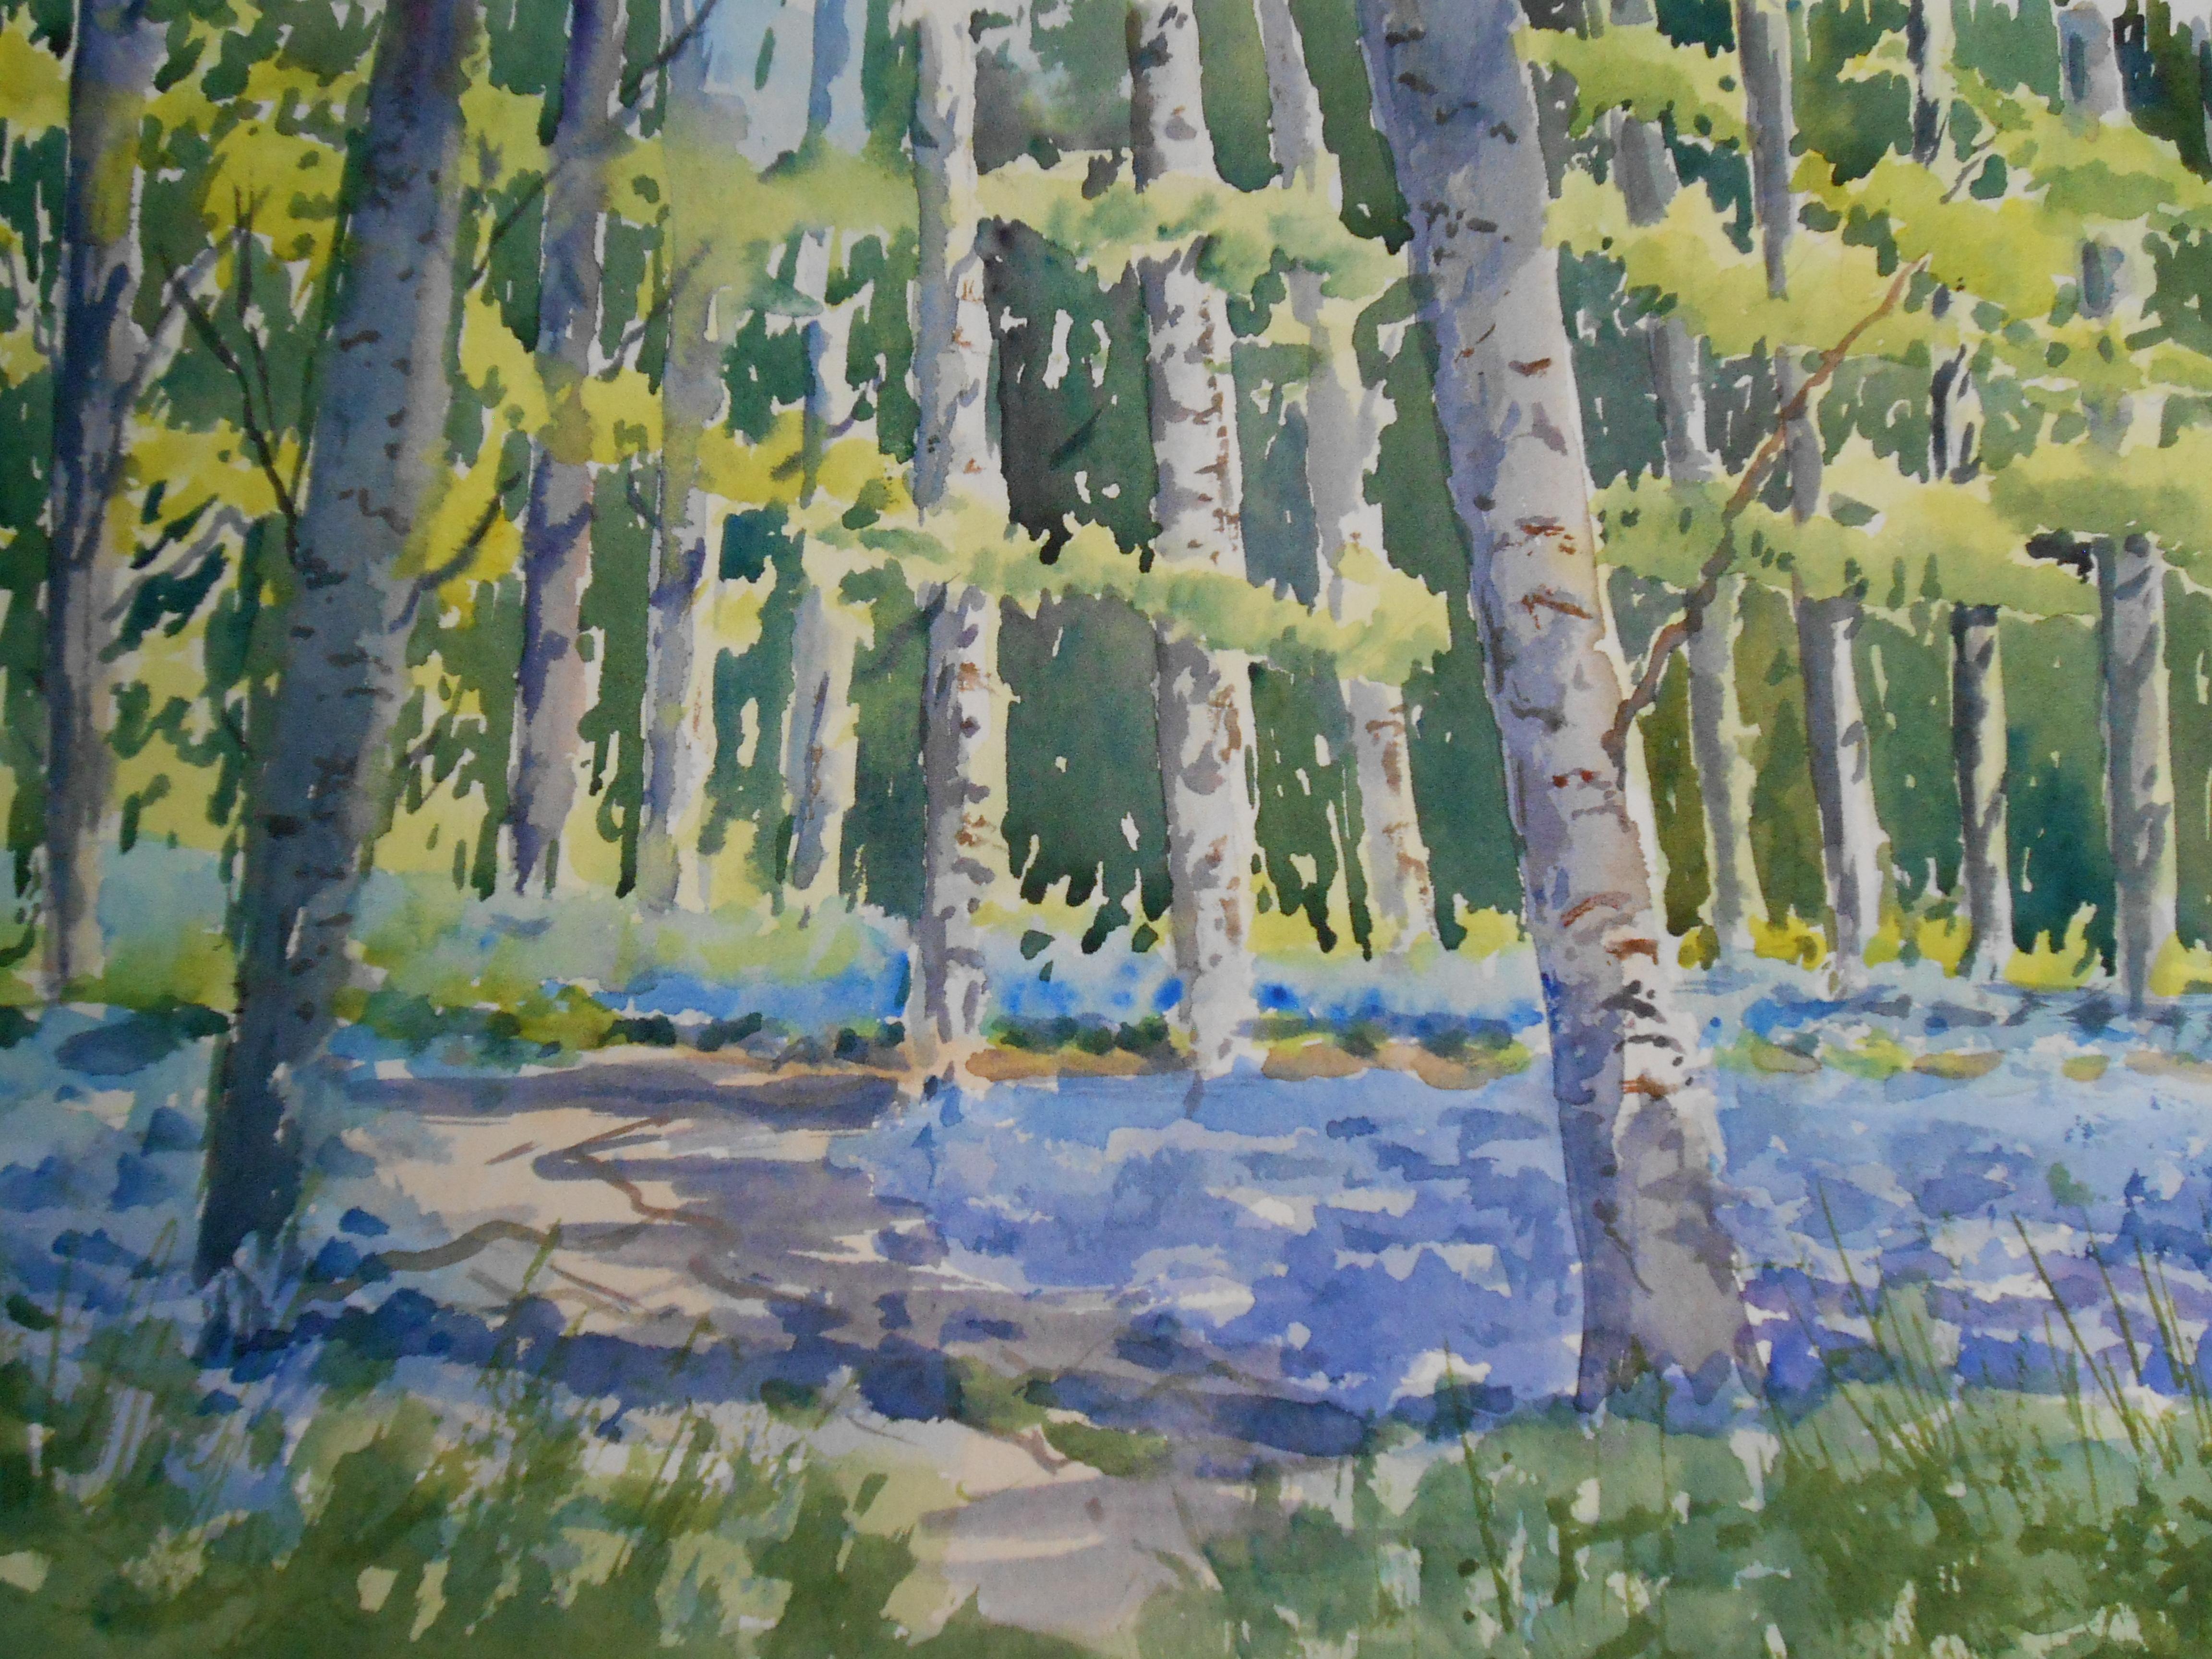 04-29 Among the Bluebells